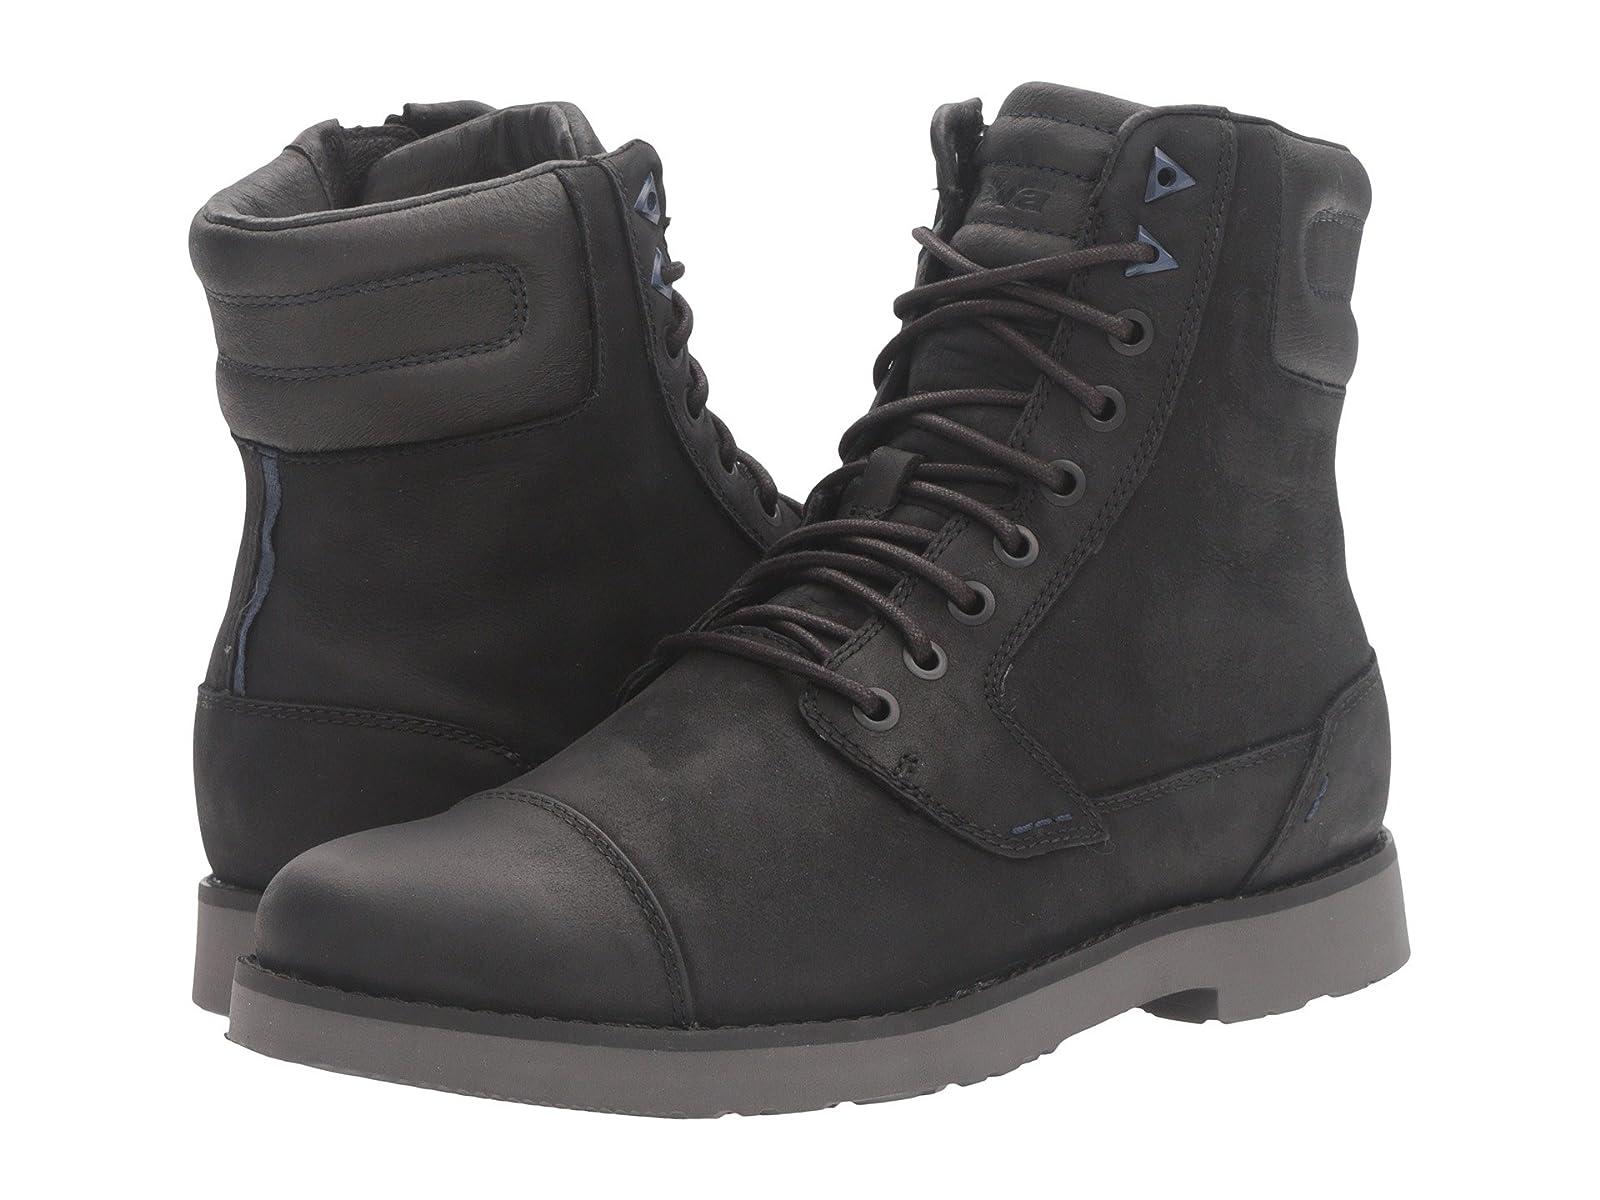 Teva Durban Tall LeatherCheap and distinctive eye-catching shoes